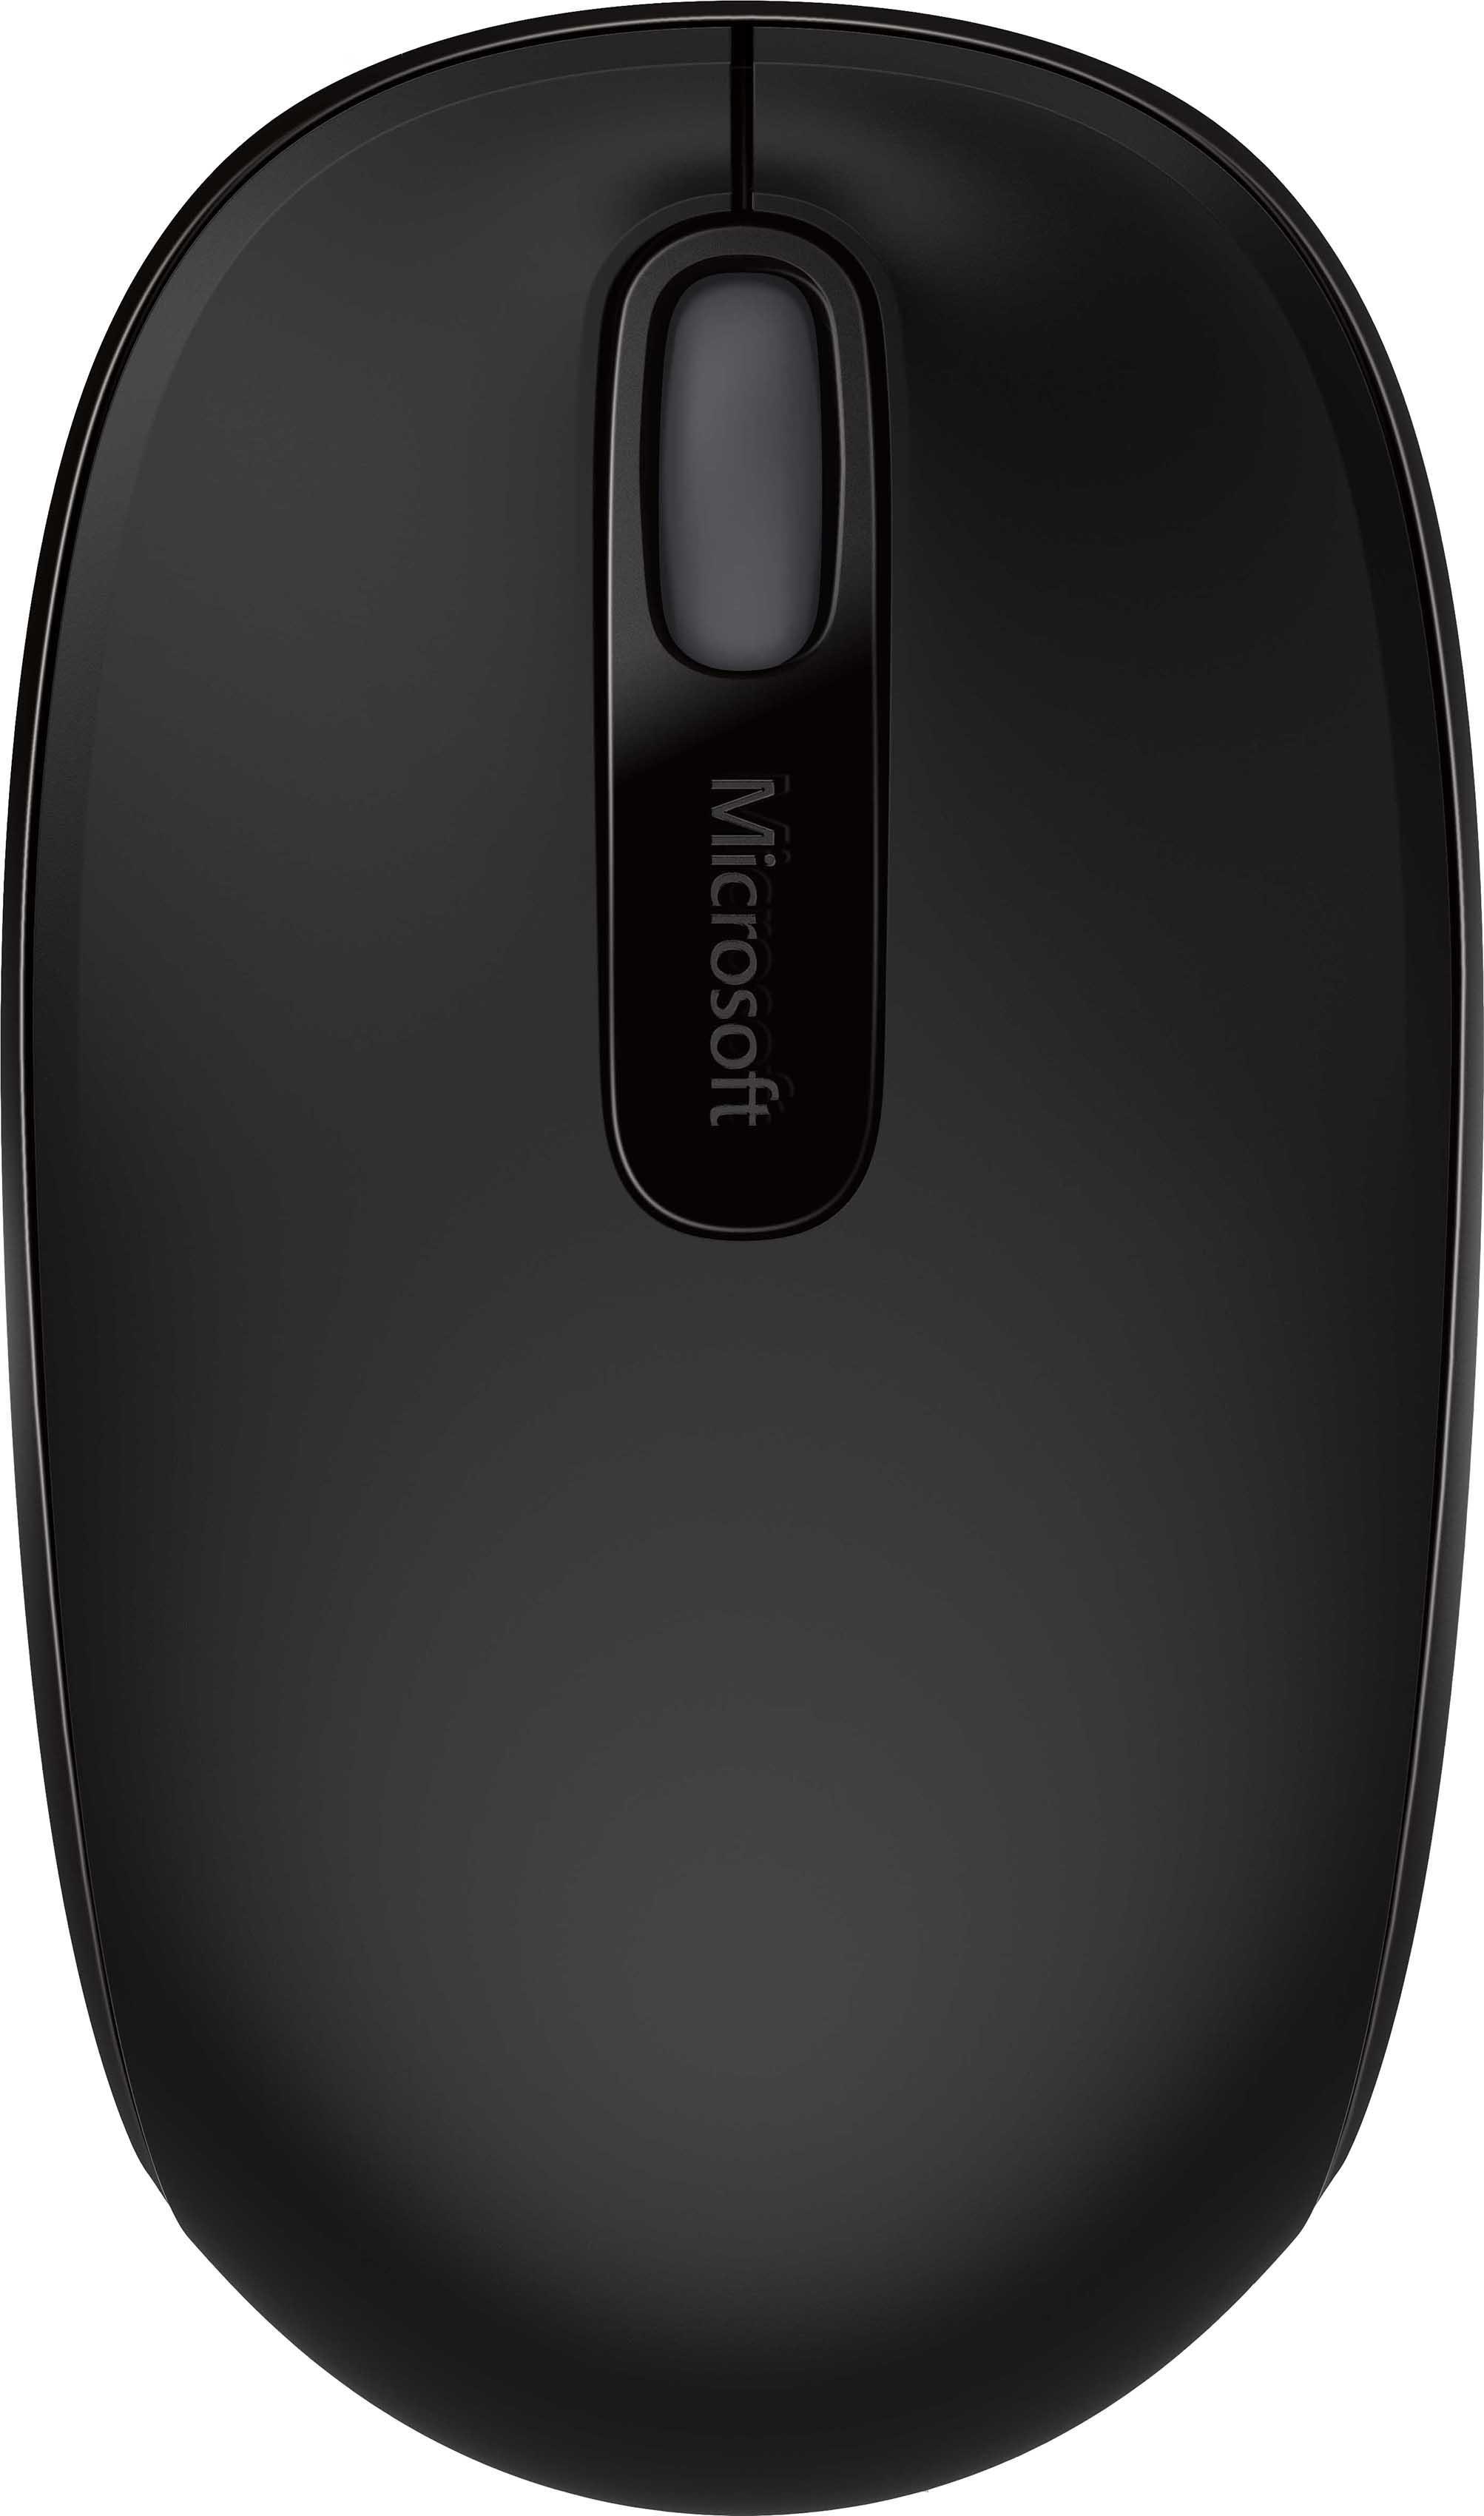 Microsoft draadloze mobiele muis 1850 in de webshop van OTTO kopen